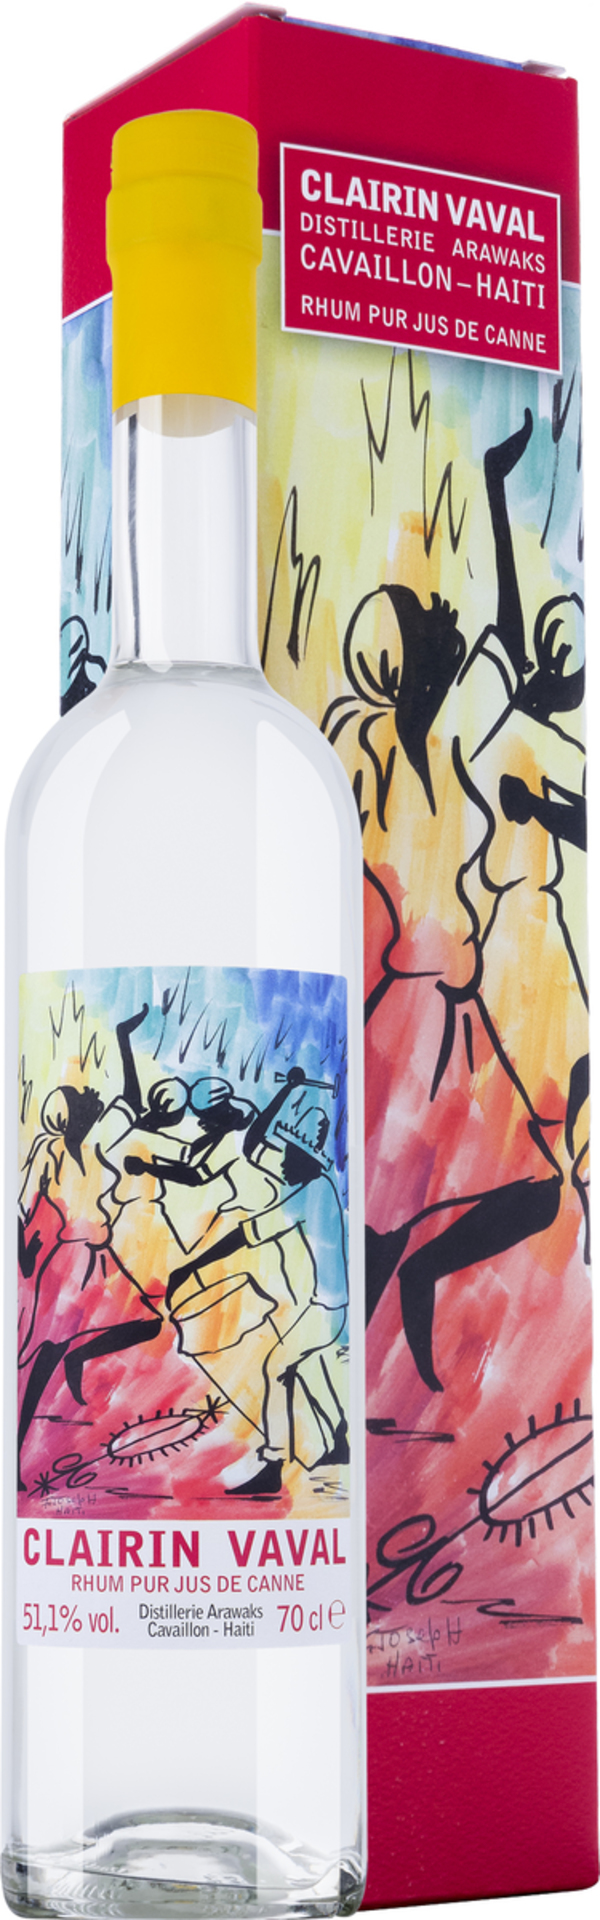 Clairin Vaval Rum in Gp   - Rum - Velier, Haiti, trocken, 0,7l